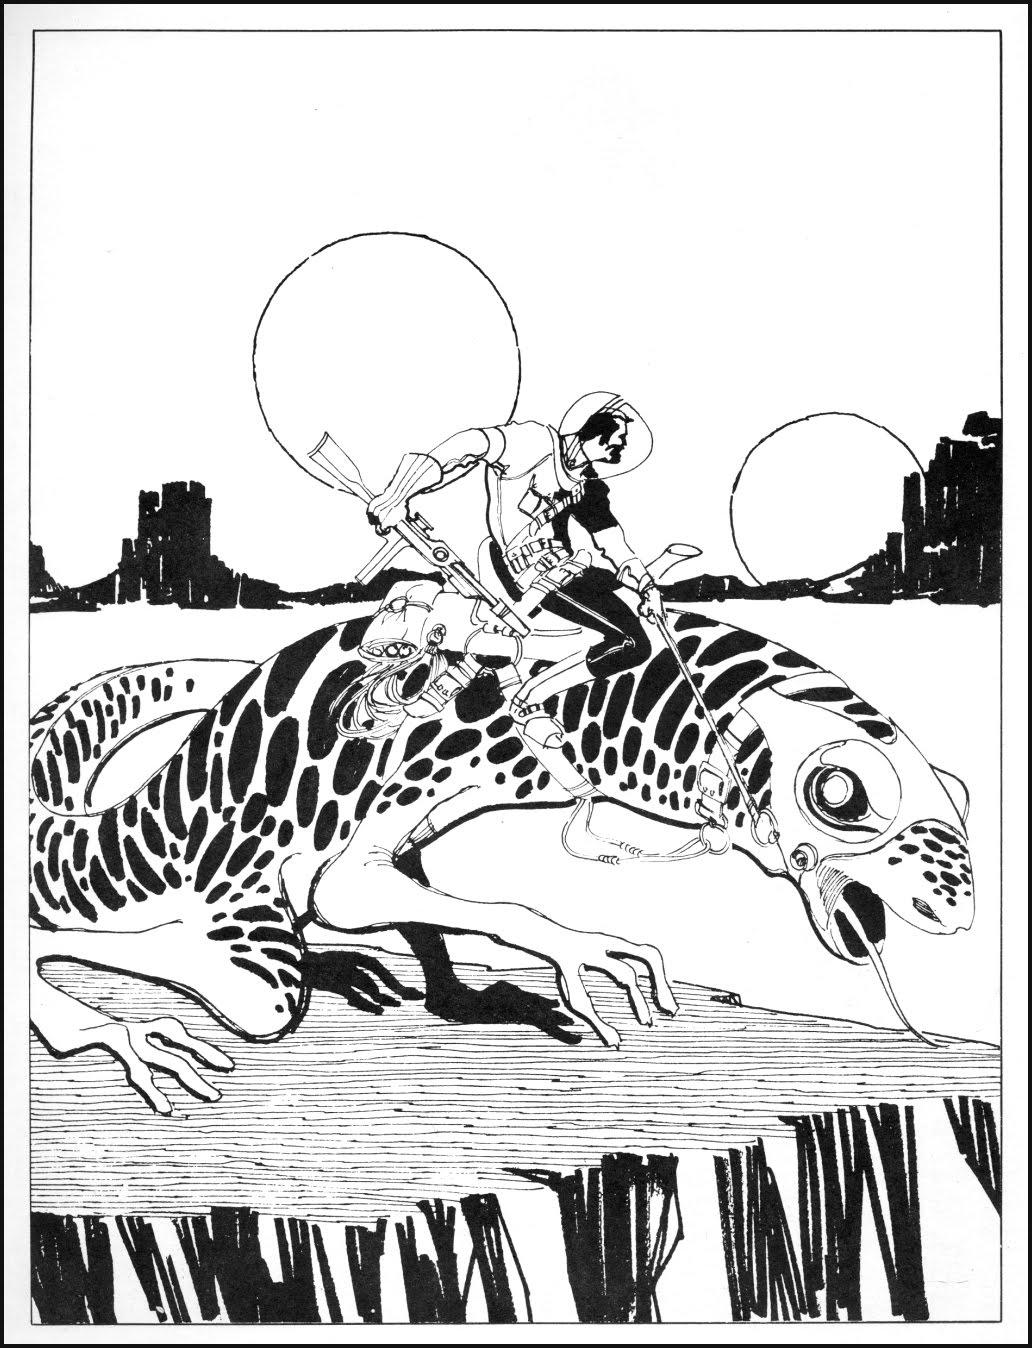 Frederick Schiller Jim Steranko S Promotional